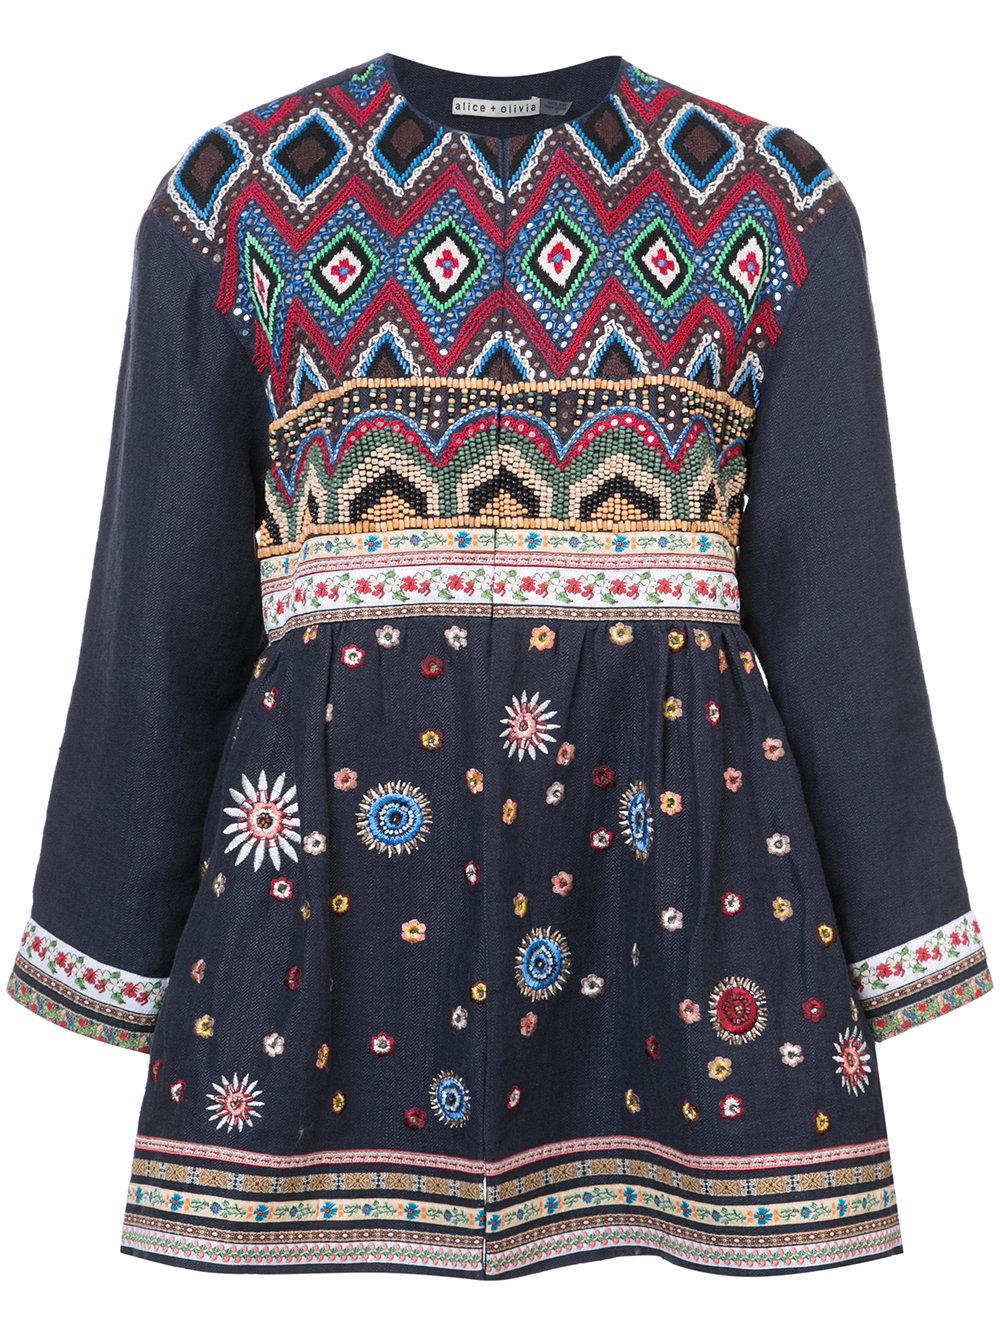 ALICE+OLIVIA jacket - $795